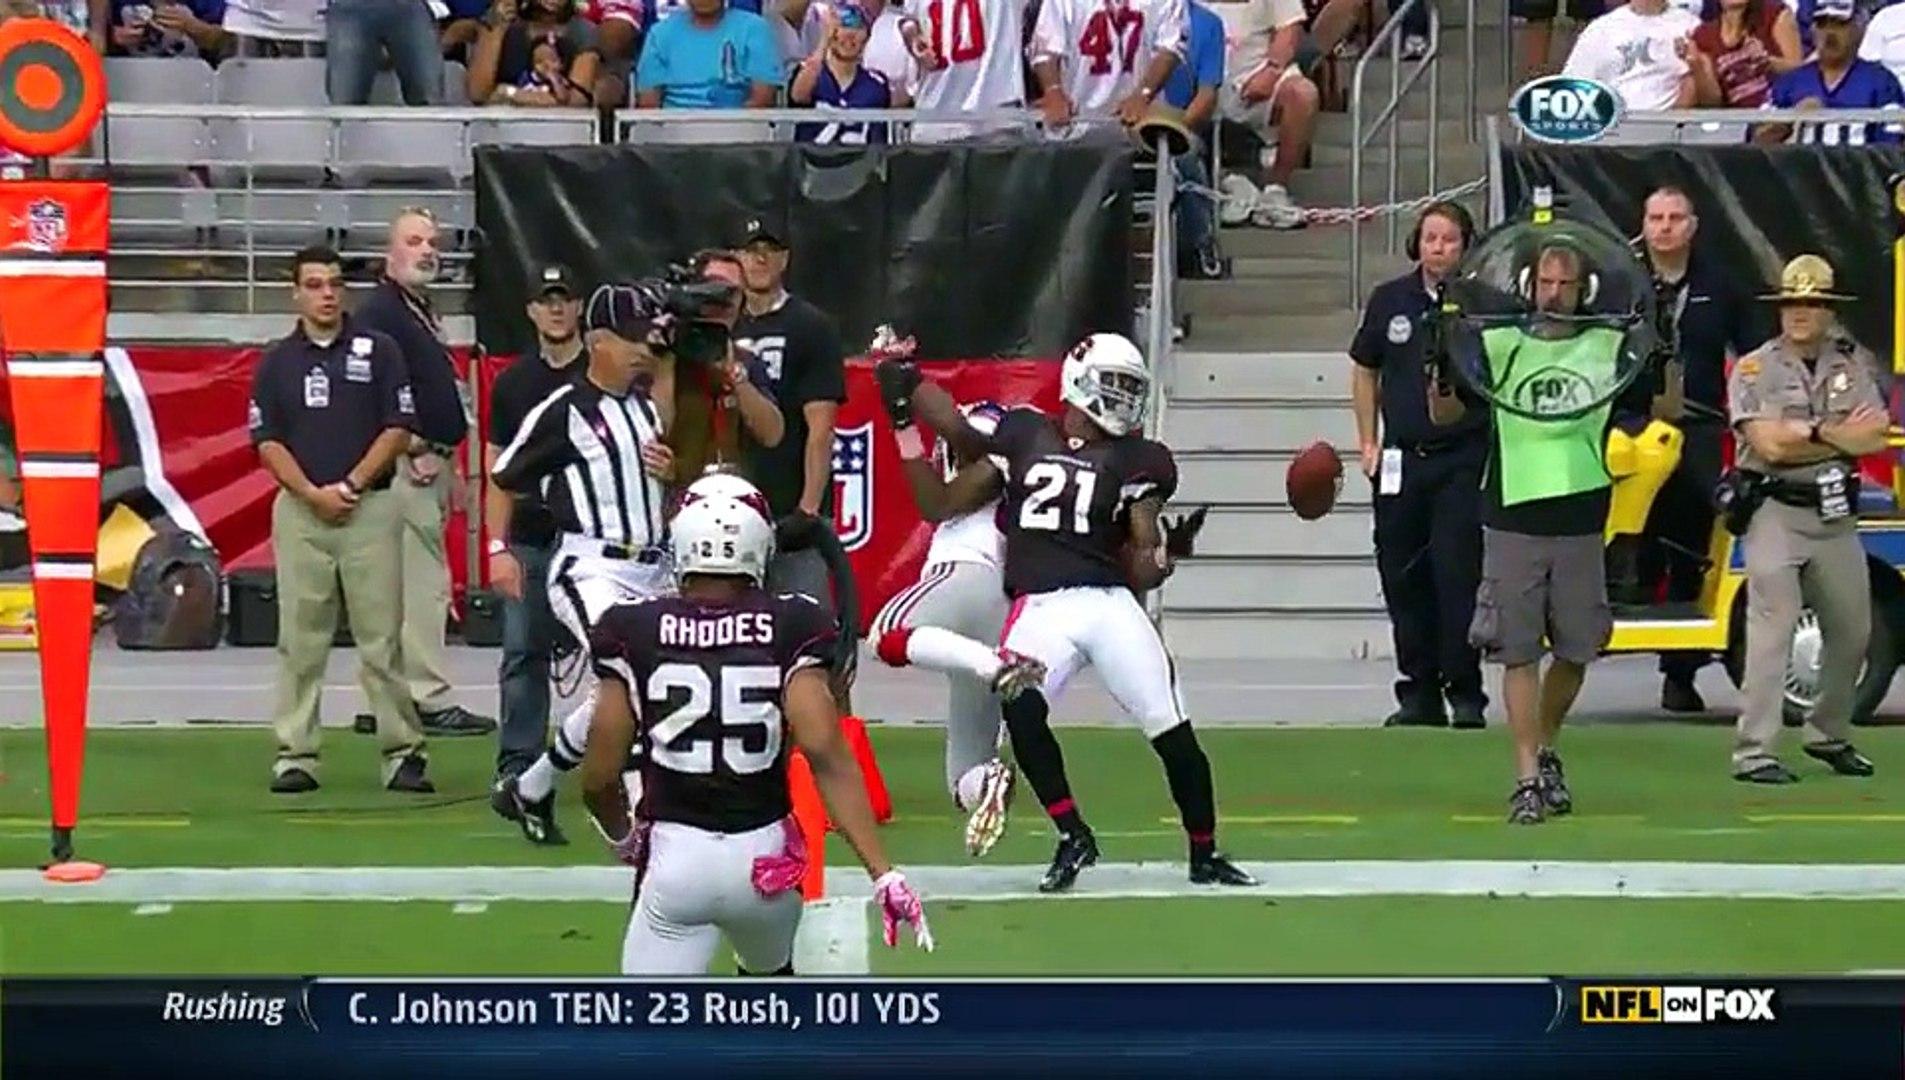 NFL 2011-12 W04 - Arizona Cardinals vs New York Giants 2011-10-02